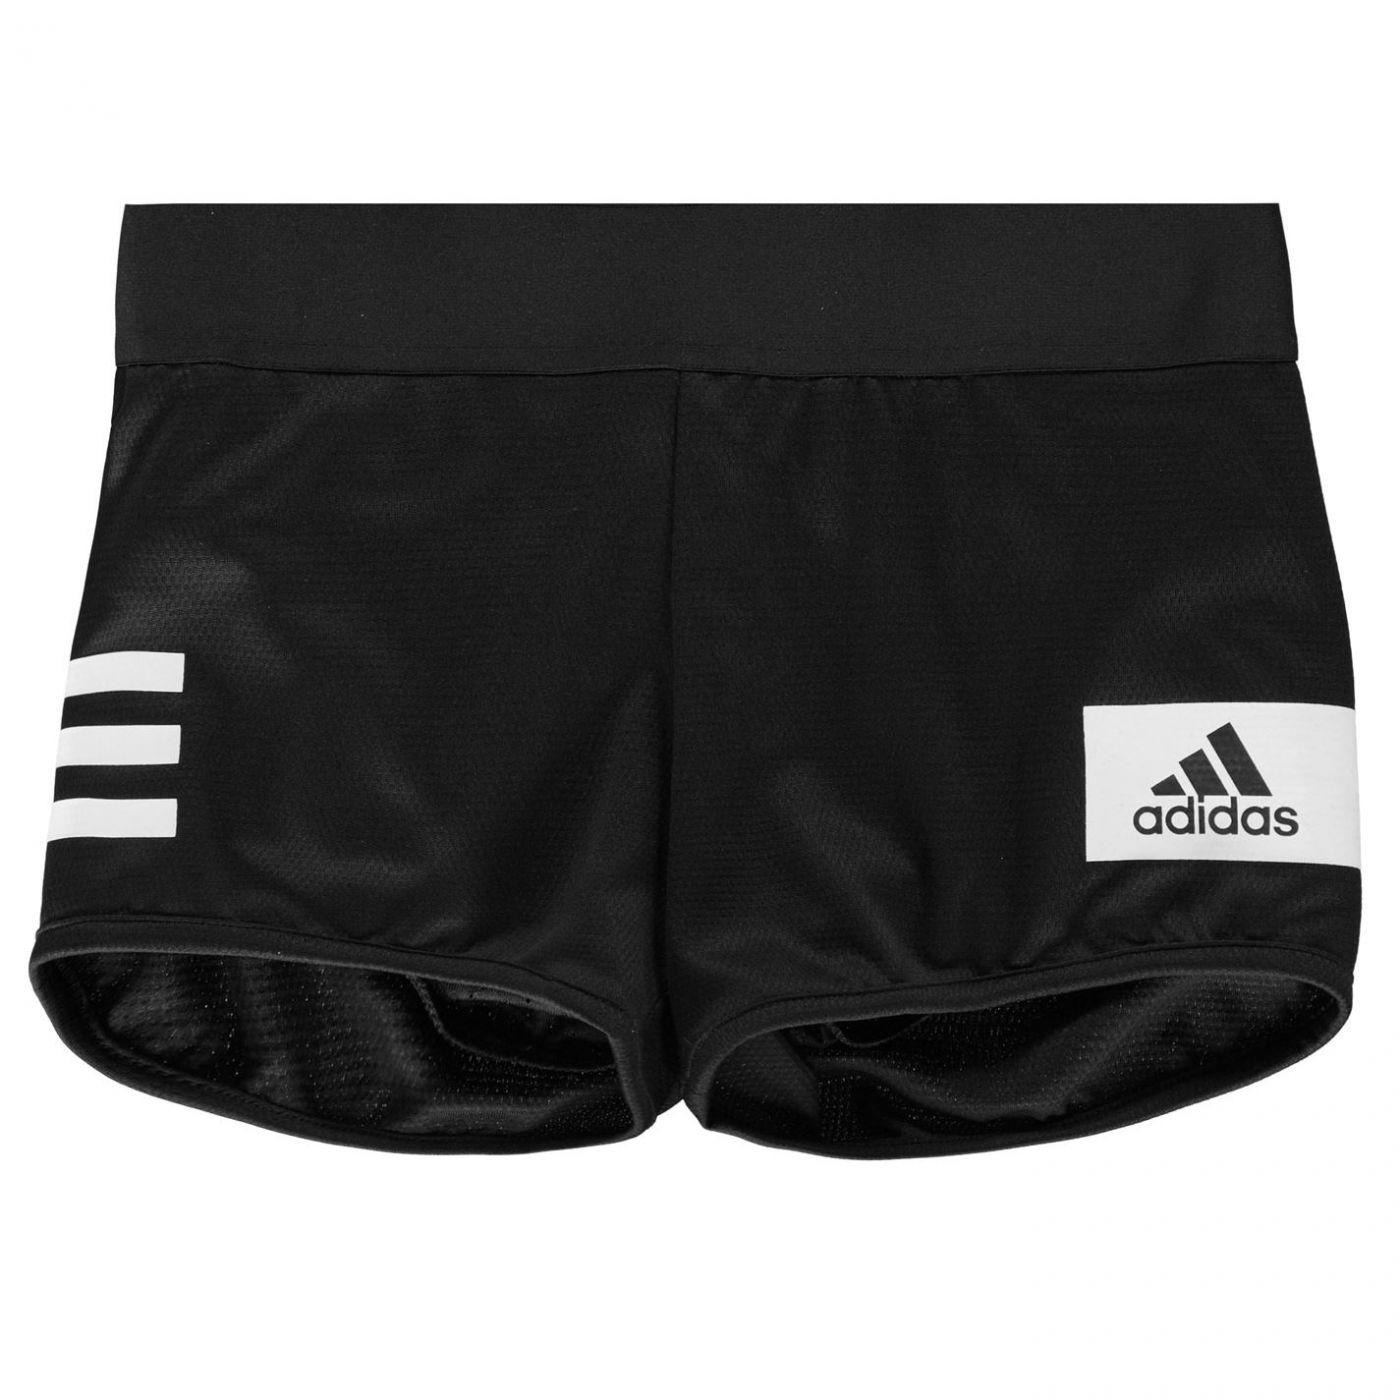 Adidas Cool Training Short Girls